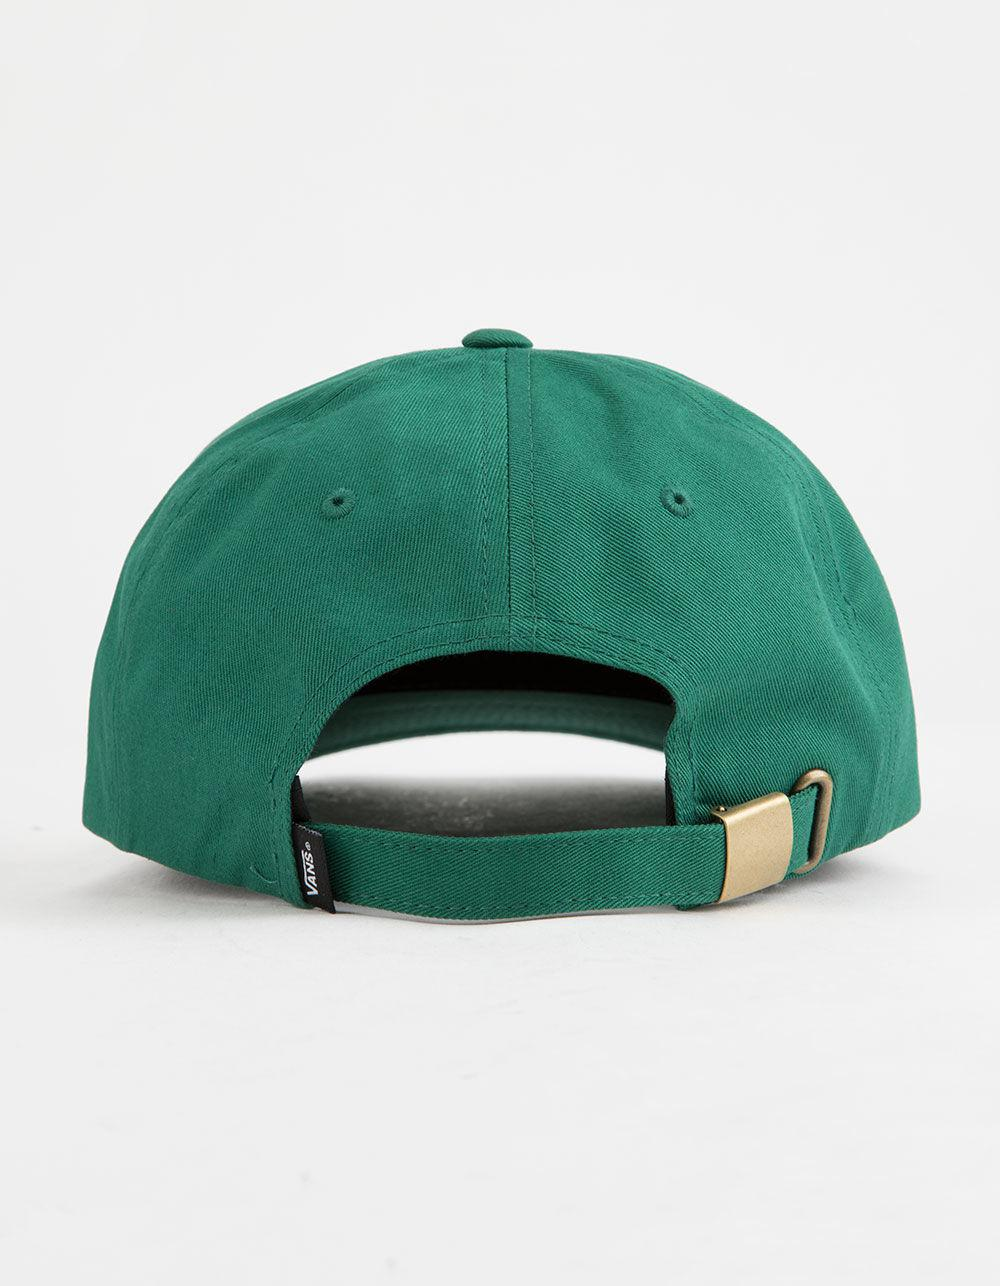 cff6634cc0aacb Lyst - Vans Curved Bill Jockey Mens Strapback Hat in Green for Men